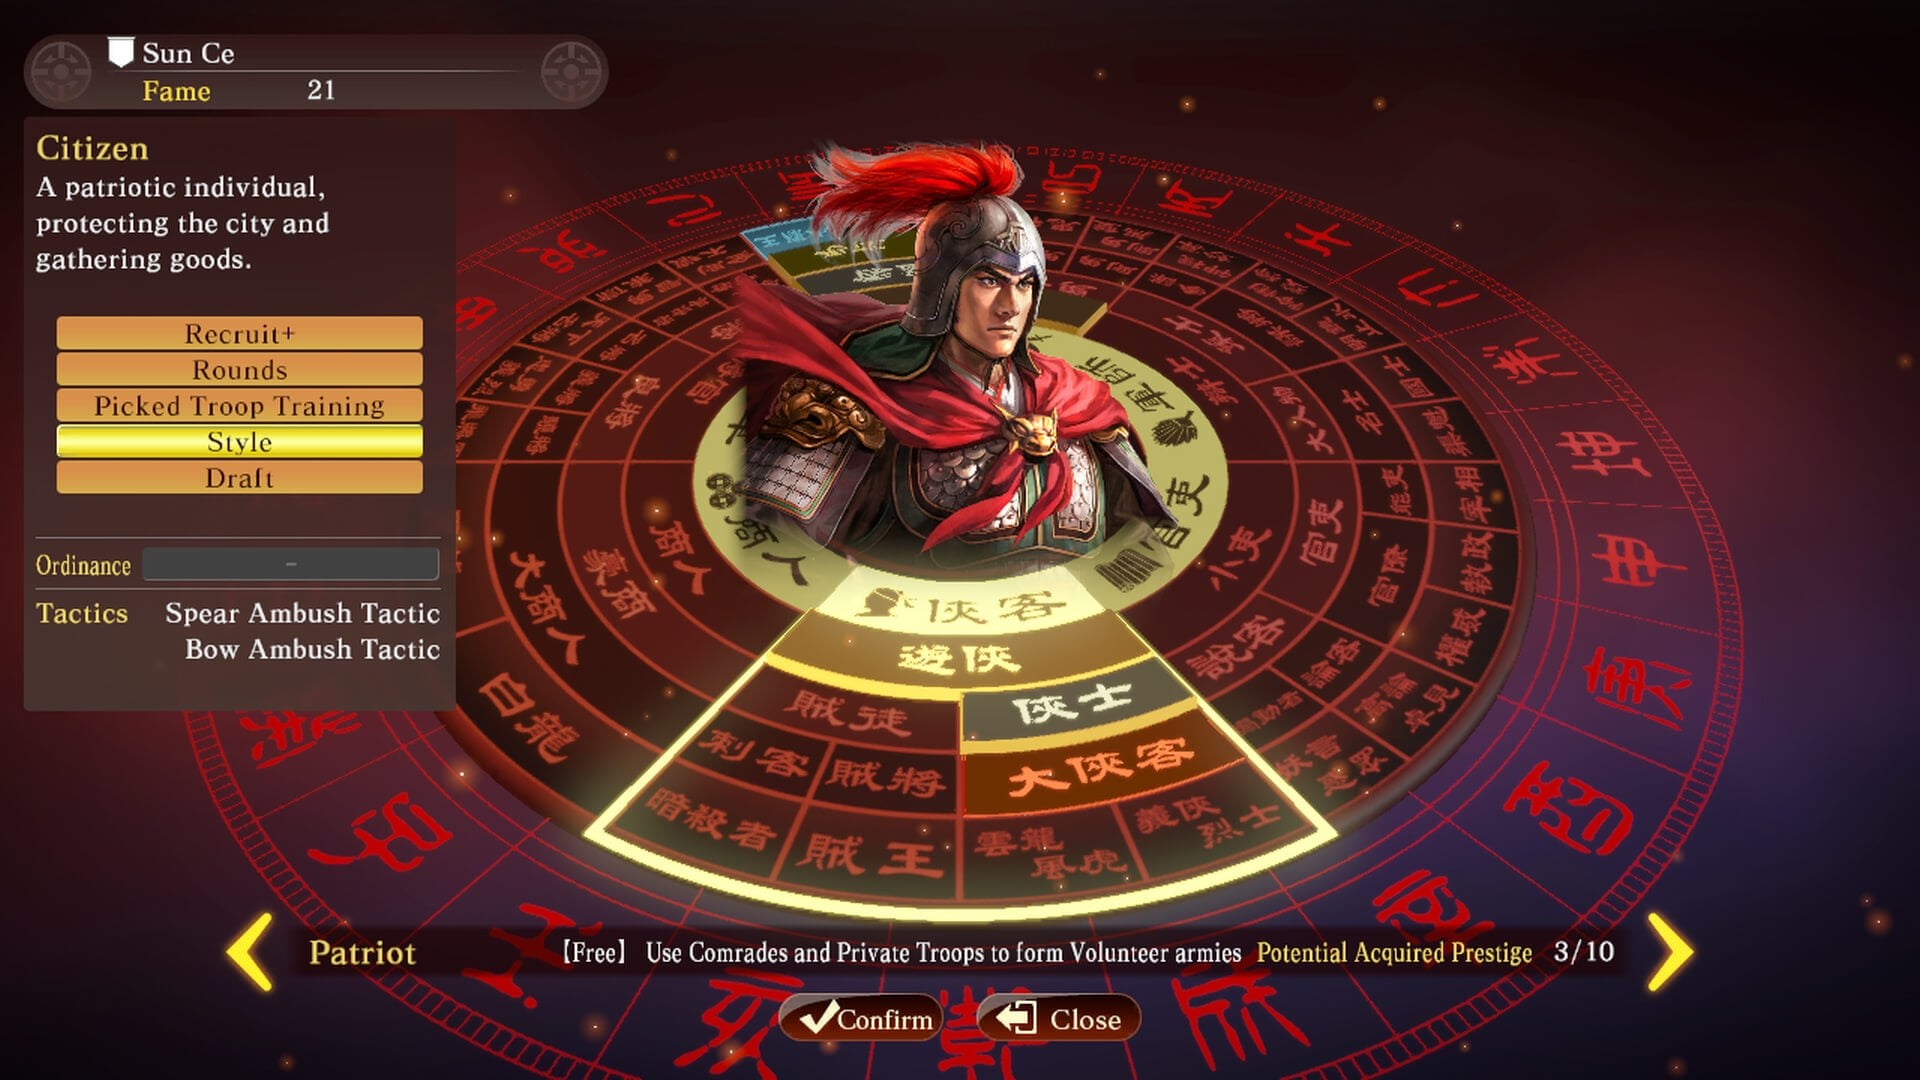 Three kingdoms strategy online game